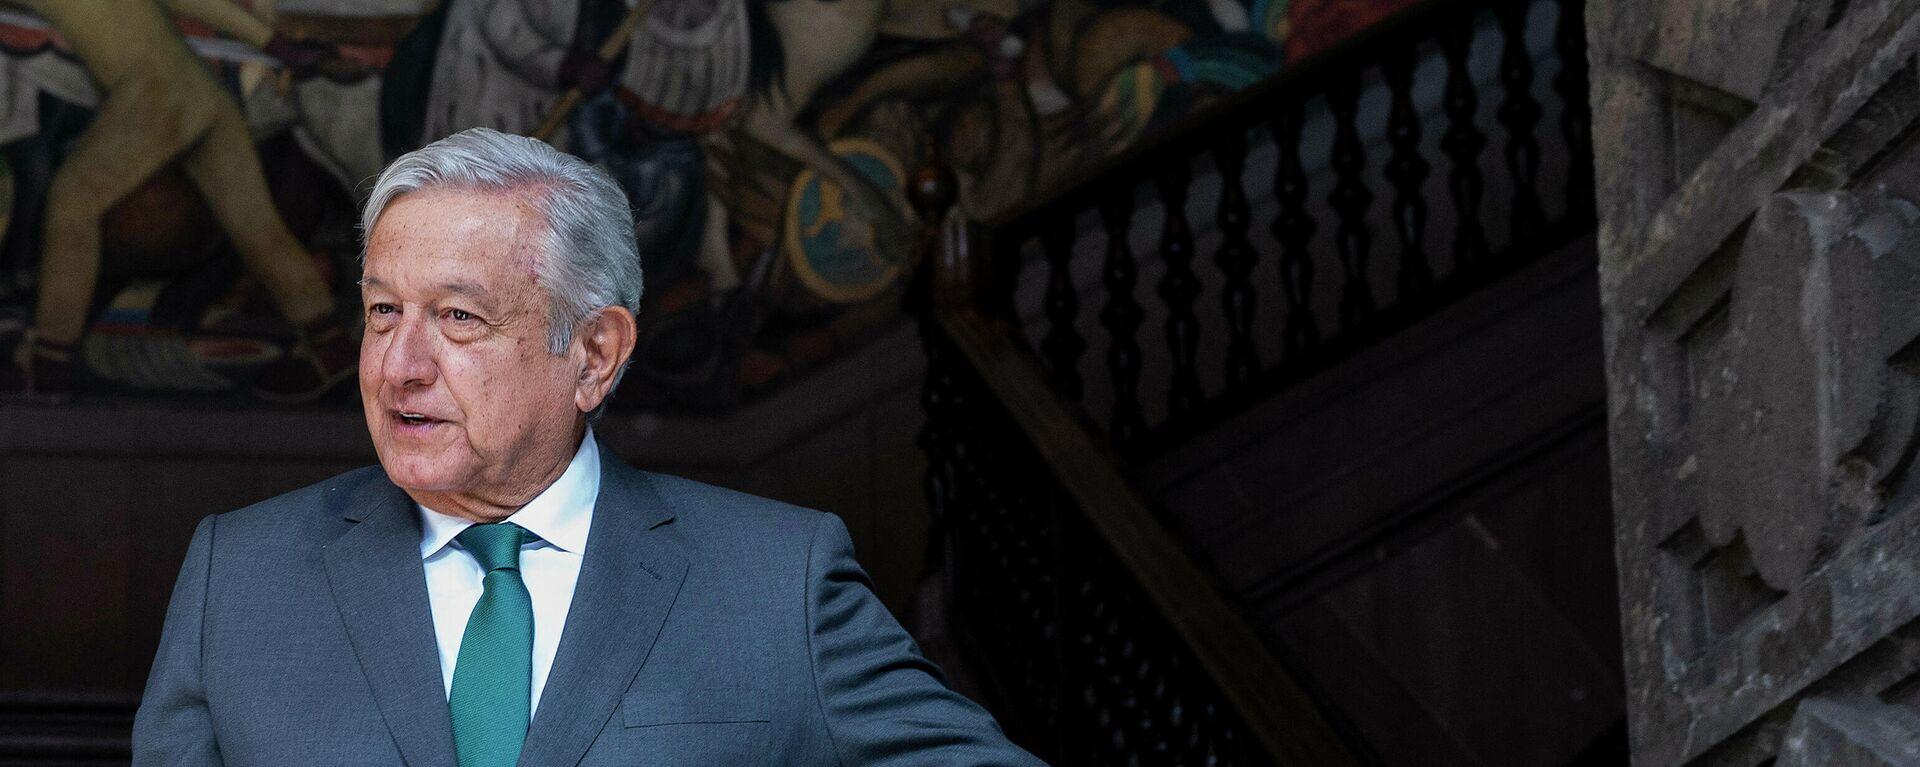 Andrés Manuel López Obrador, presiente de México - Sputnik Mundo, 1920, 01.07.2021